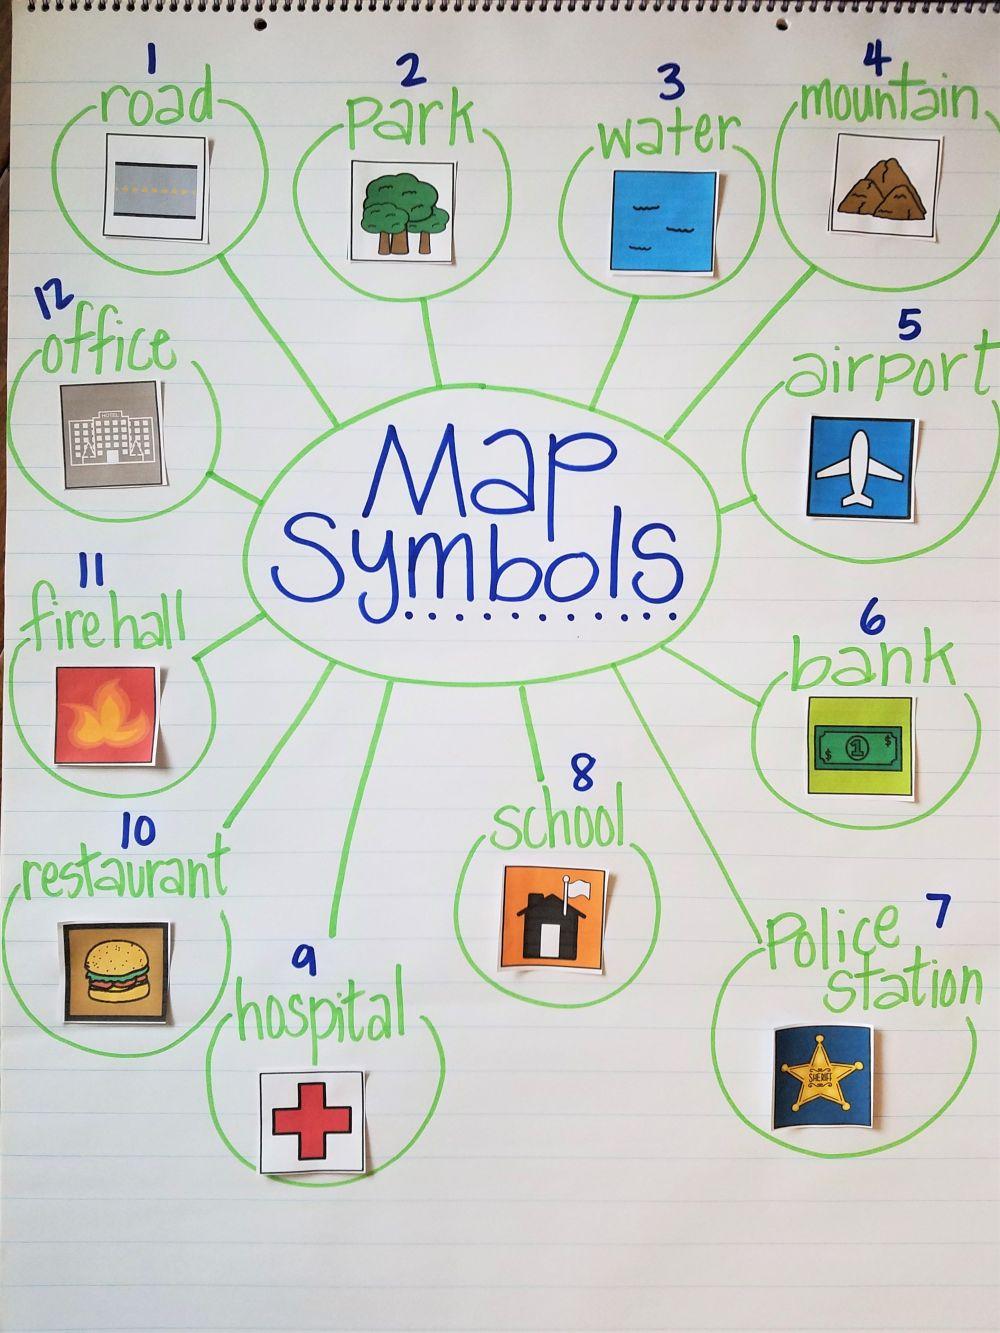 medium resolution of Simple Map Key Legend Worksheet   Printable Worksheets and Activities for  Teachers